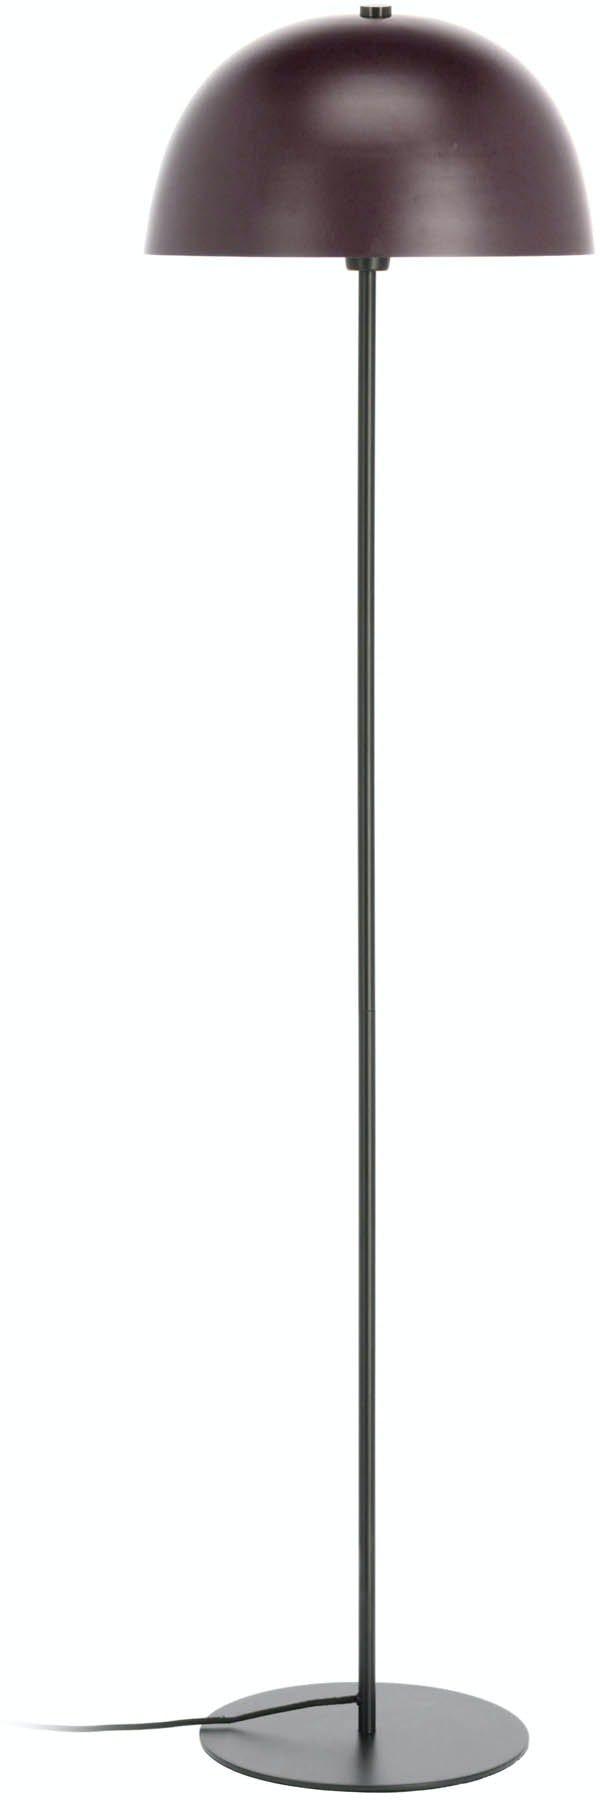 Aleyla, Gulvlampe by LaForma (H: 158 cm. B: 40 cm. L: 40 cm., Rød)